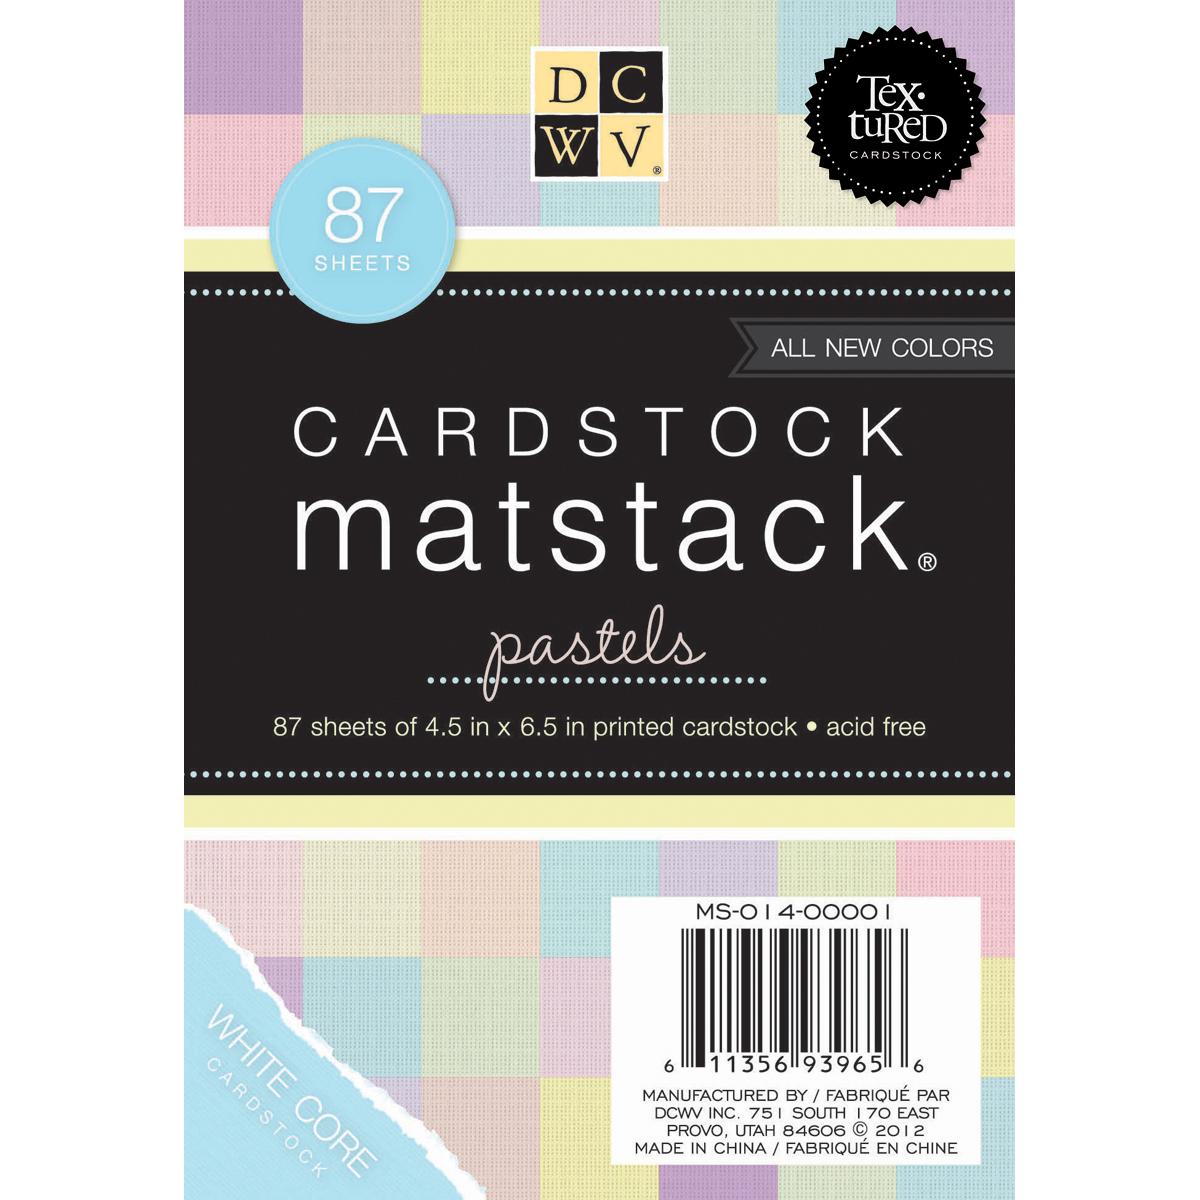 Mat Stack Pastels